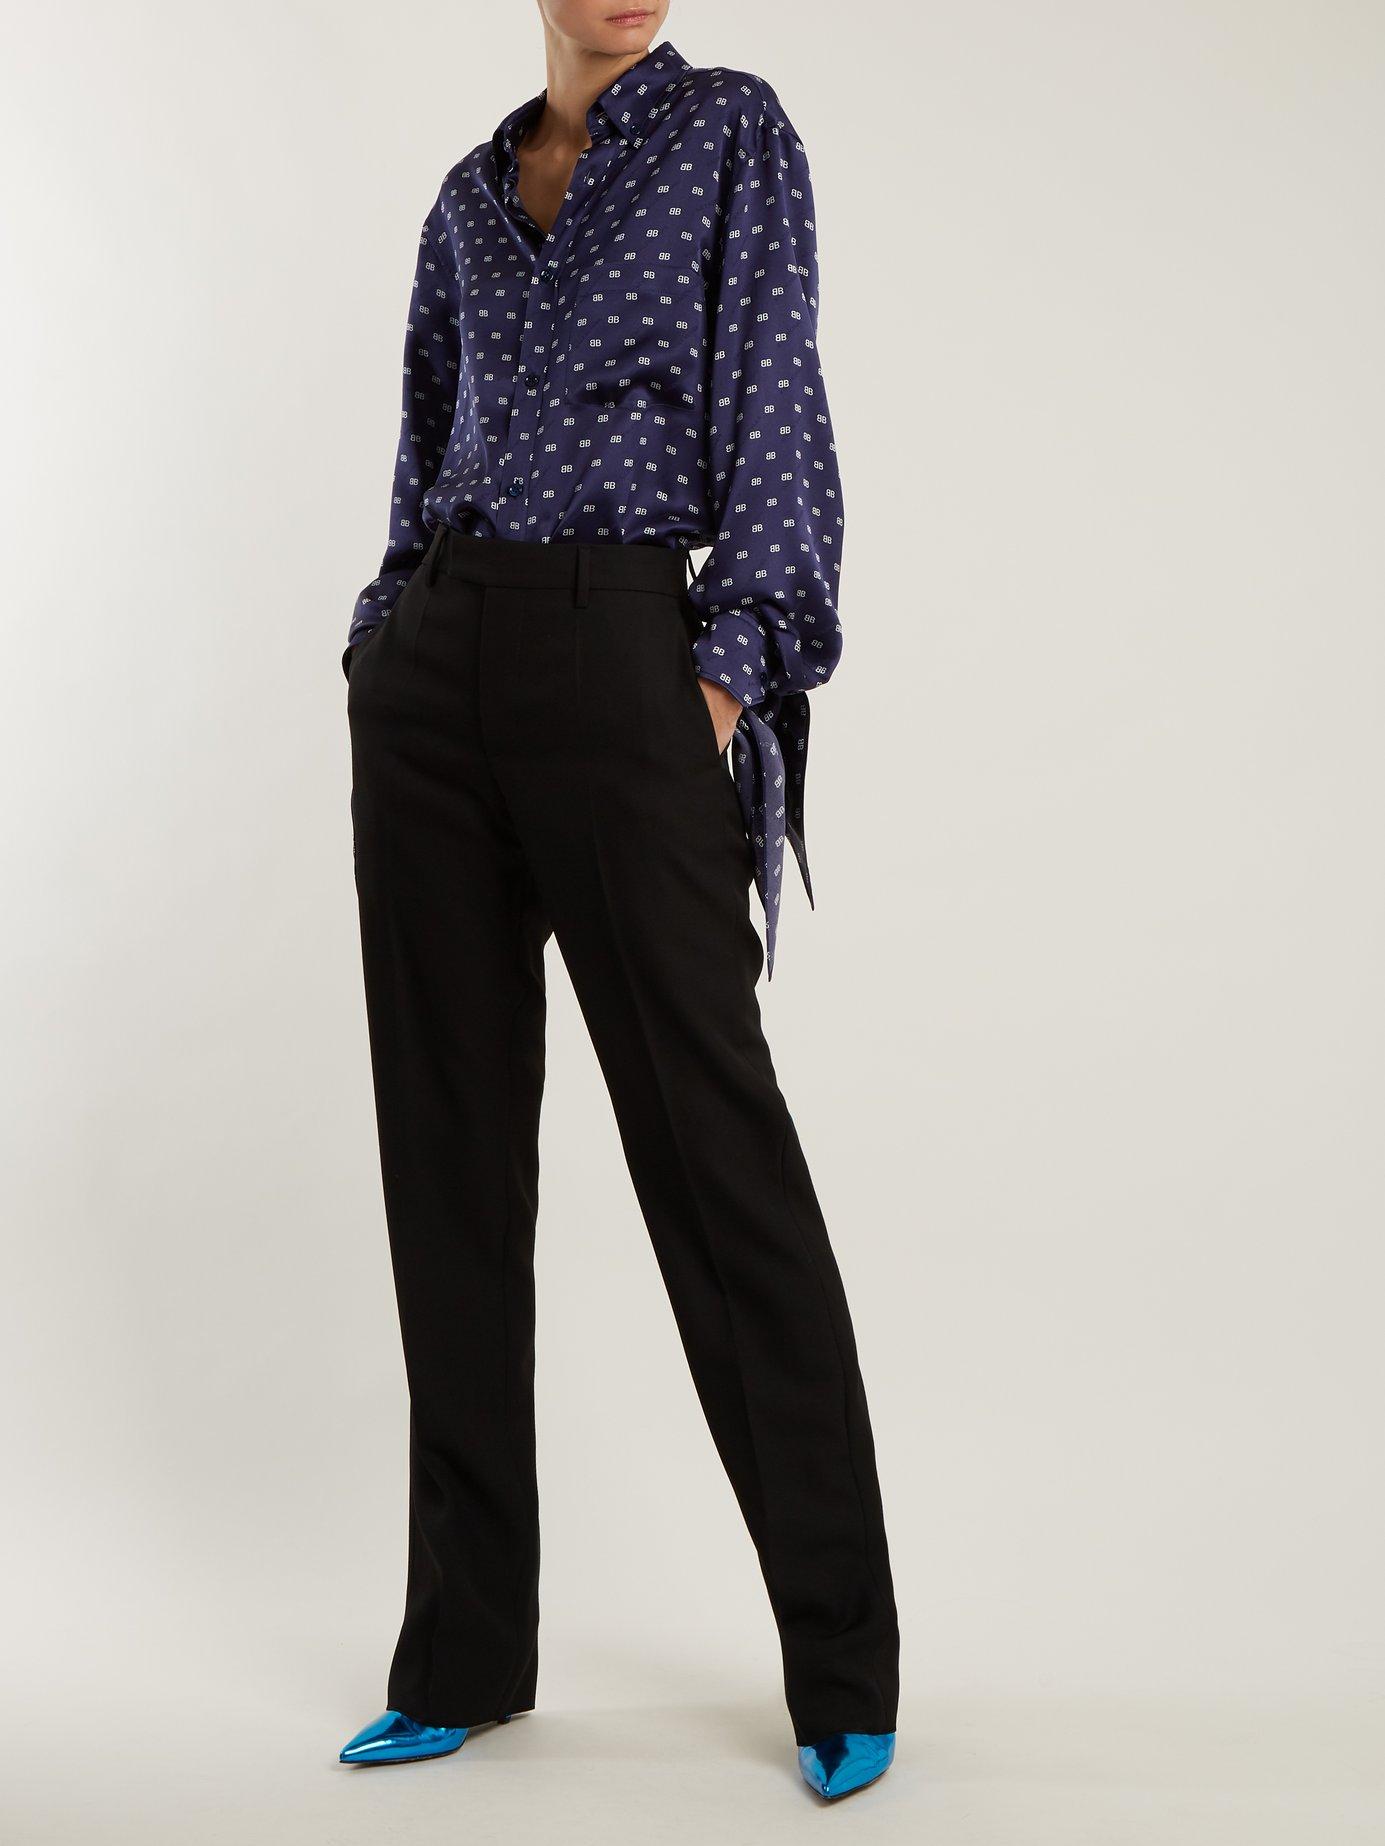 Knotted-cuff shirt by Balenciaga